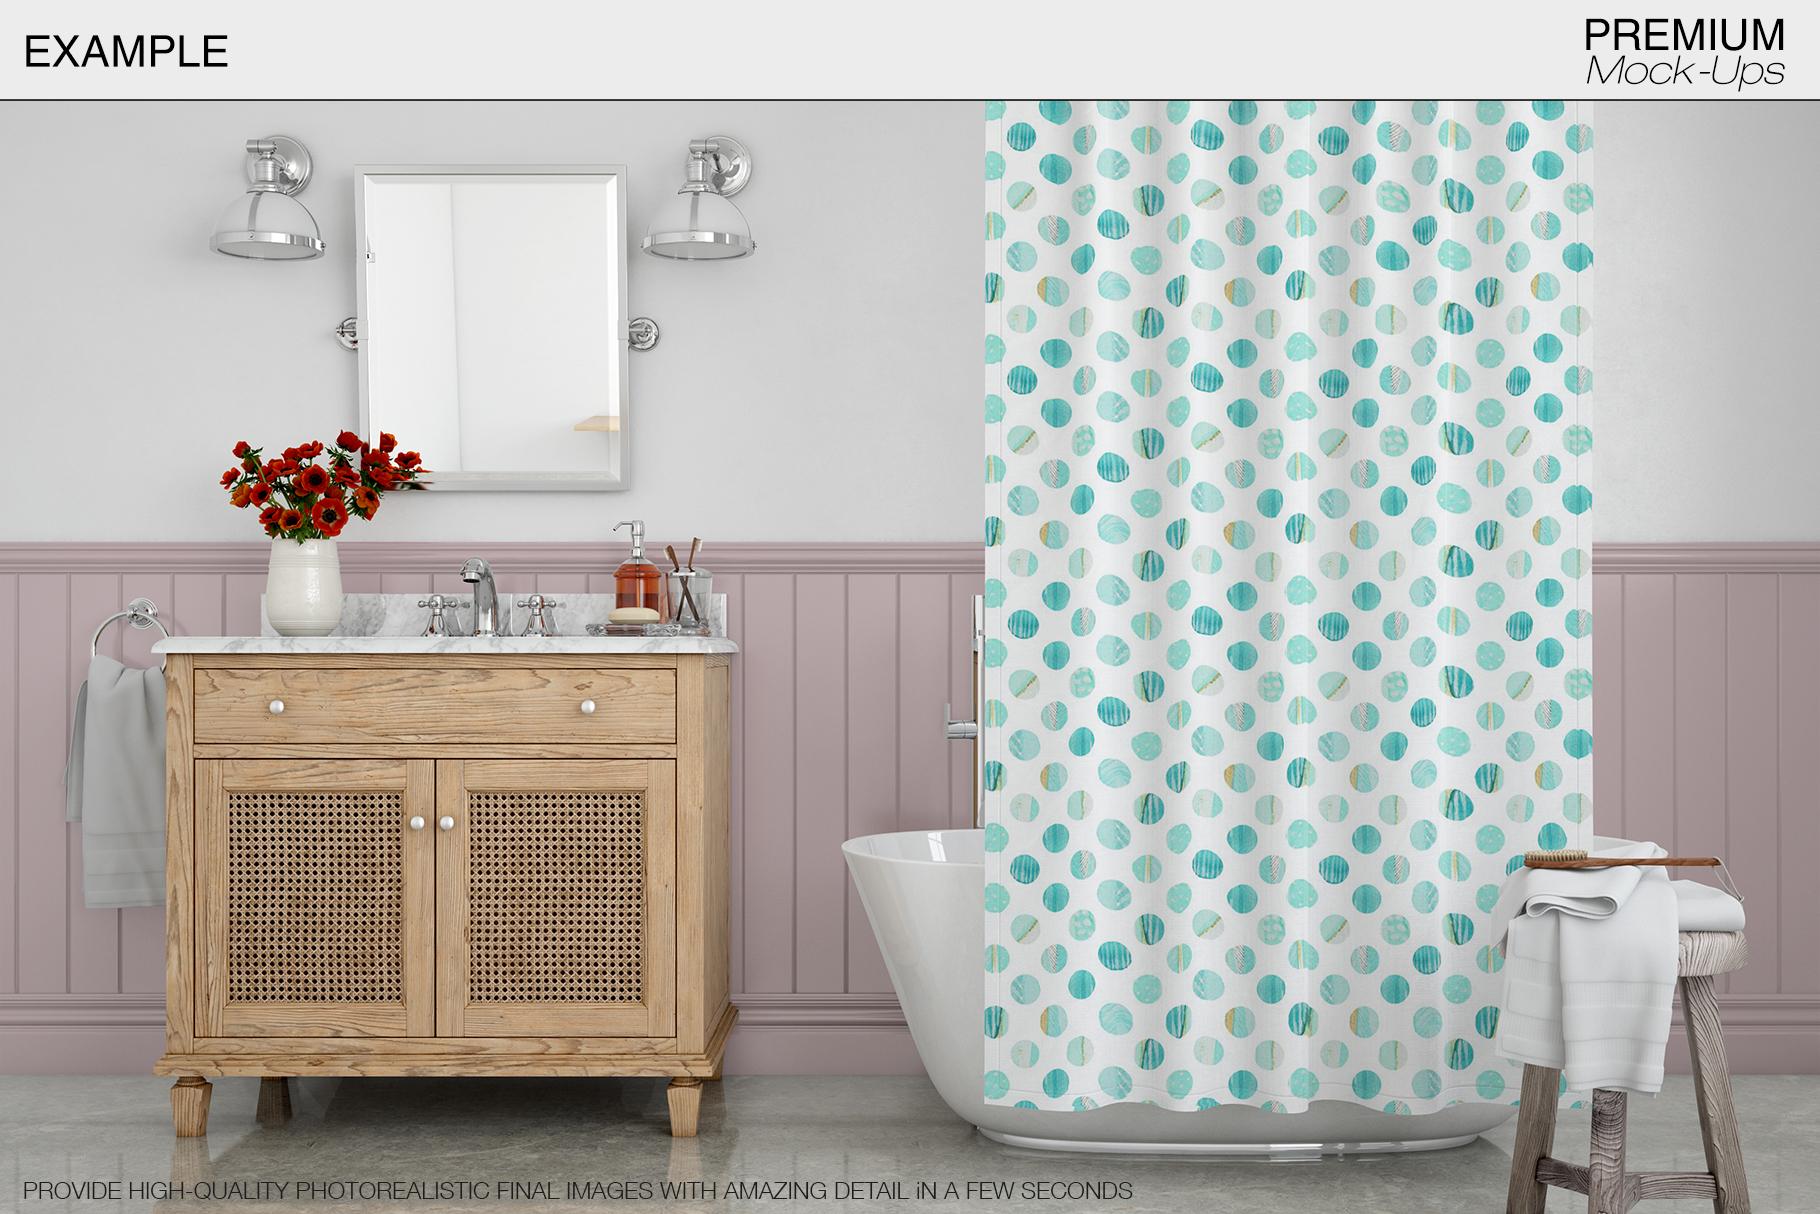 Bath Curtain Mockup Pack example image 7